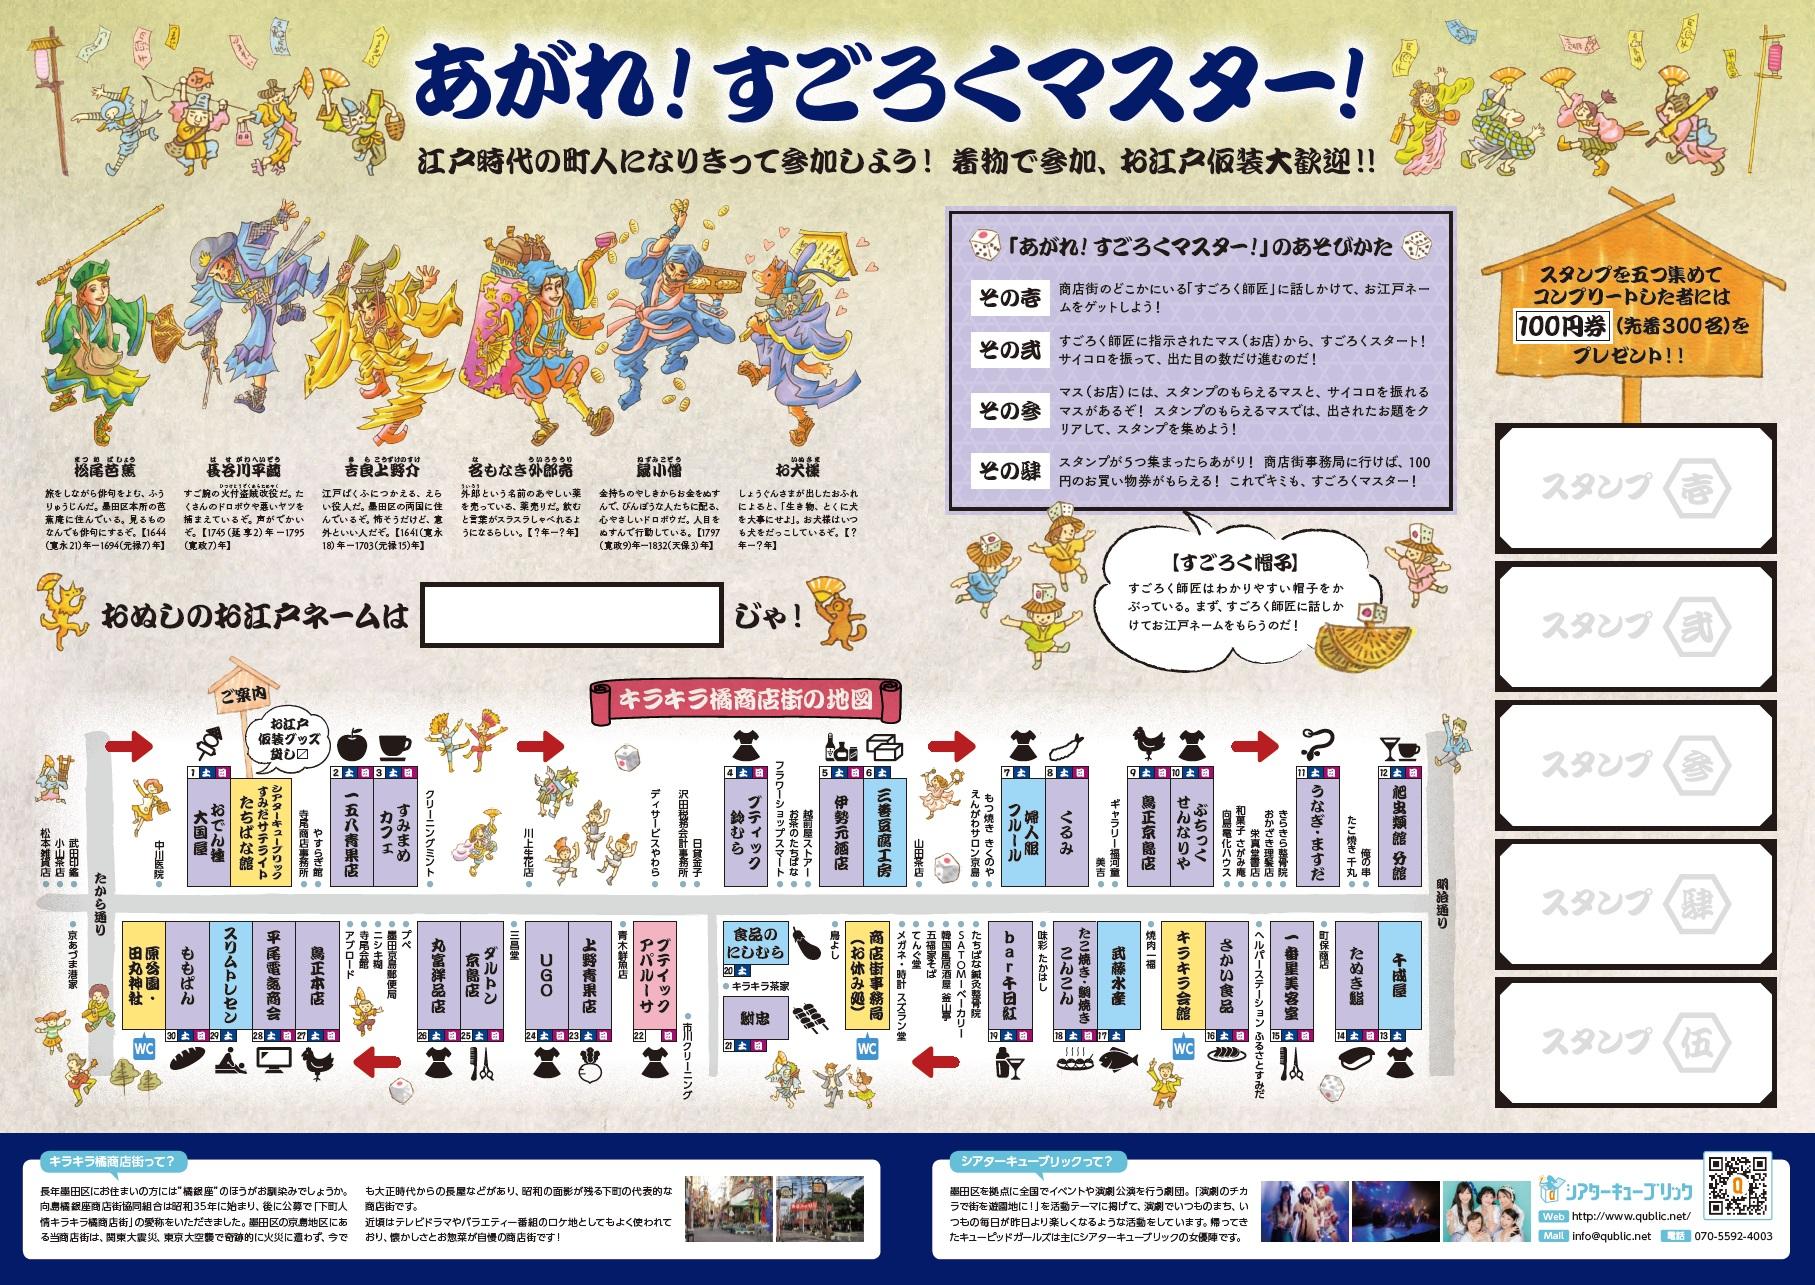 http://qublic.net/gozaruNAKA_f.jpg